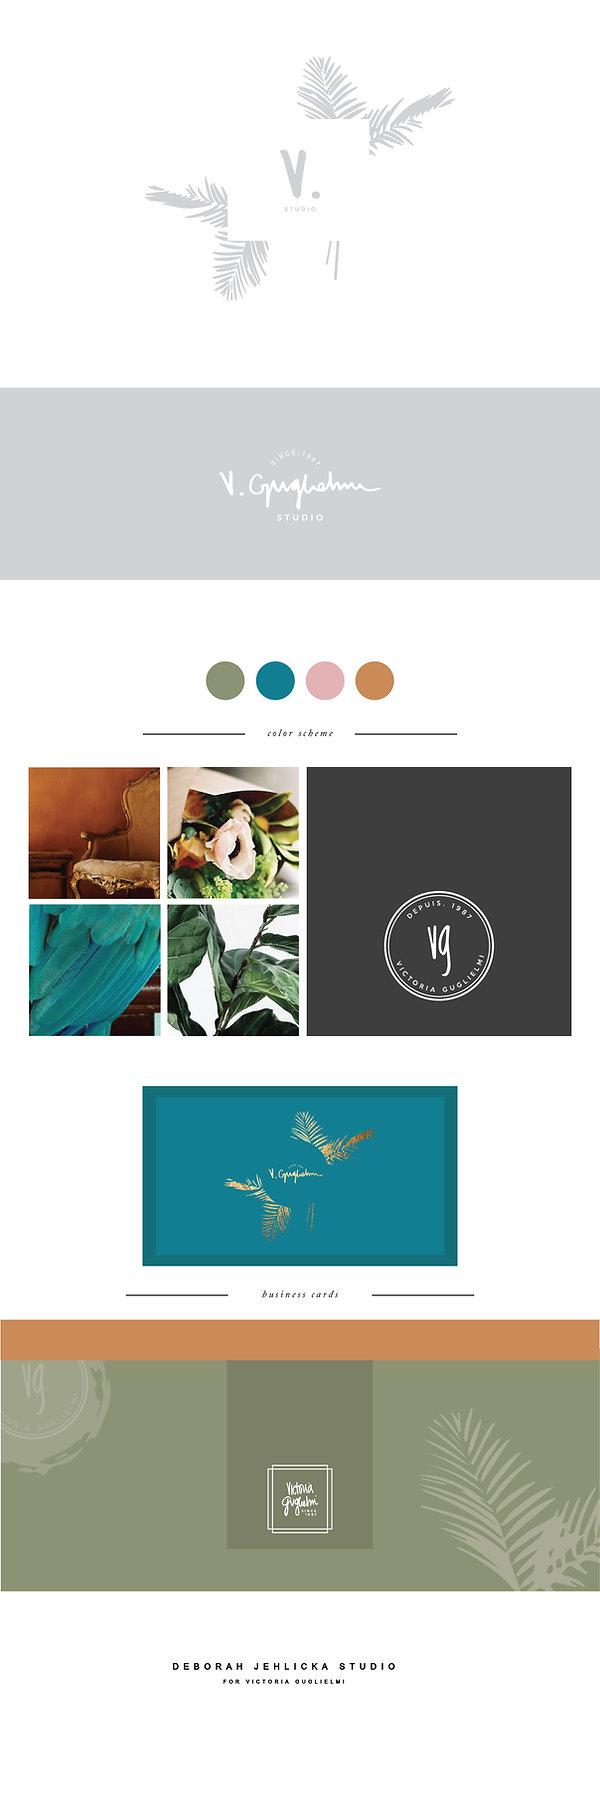 Bold colors,gold foil, watercolors, palm motif, handwritten